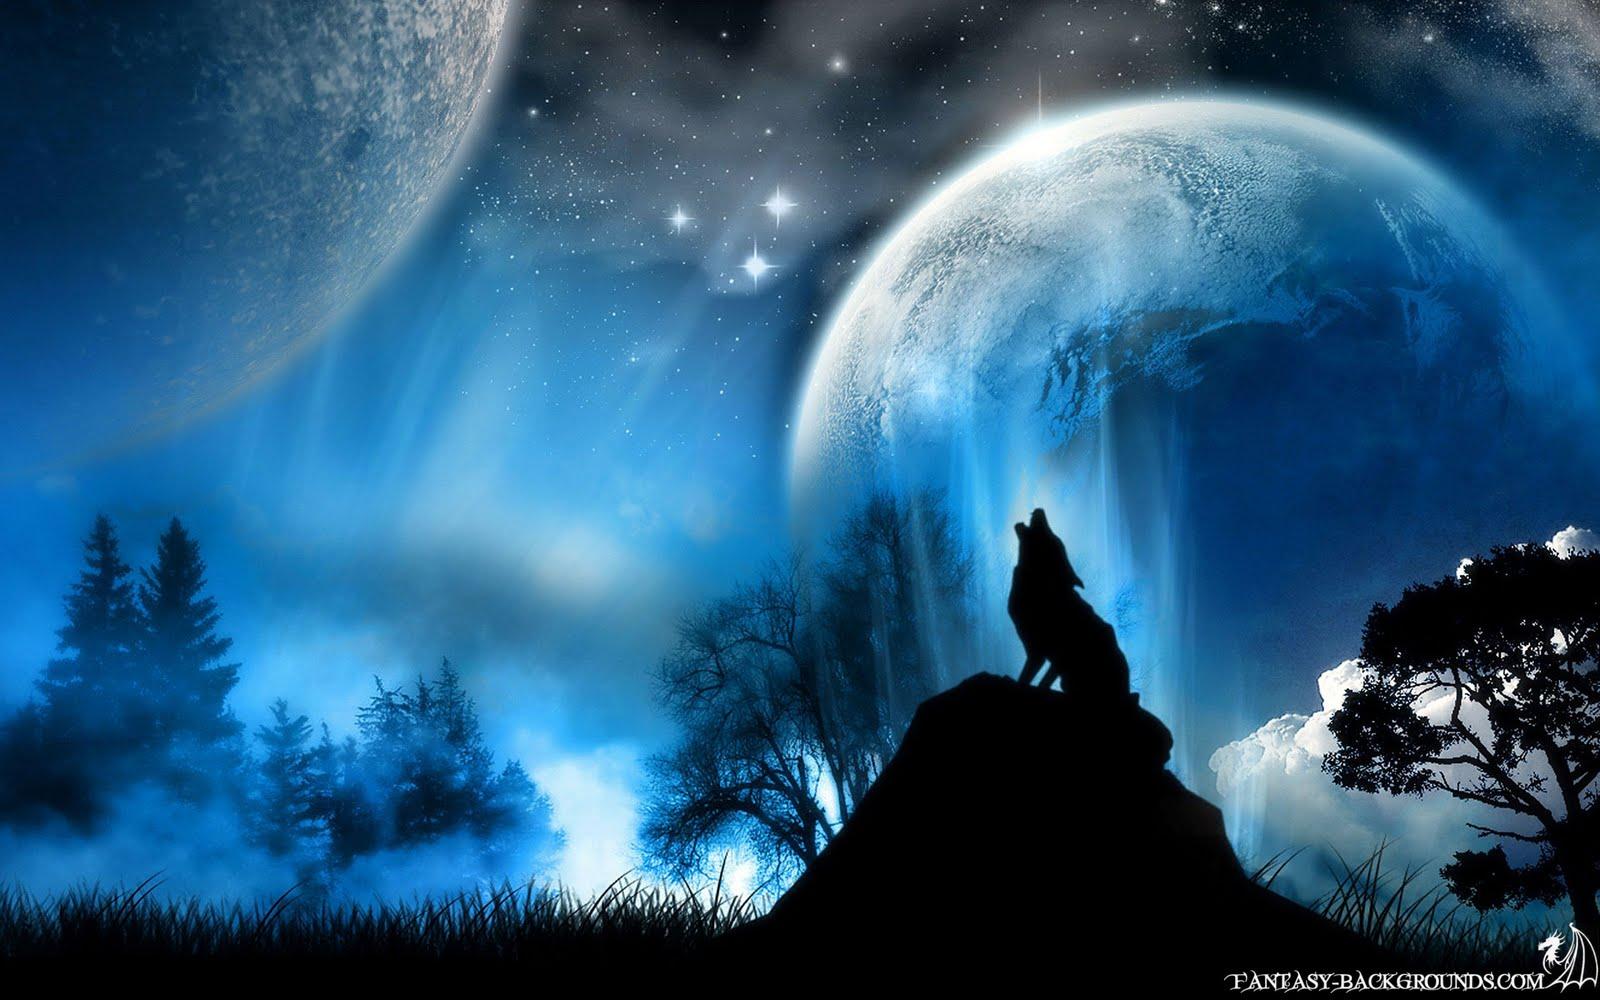 http://1.bp.blogspot.com/-TwG-398tP7U/TVdr7zCclMI/AAAAAAAAAGo/0RnfgkkaoB4/s1600/blue-fantasy-wallpaper-2560x1600.jpg